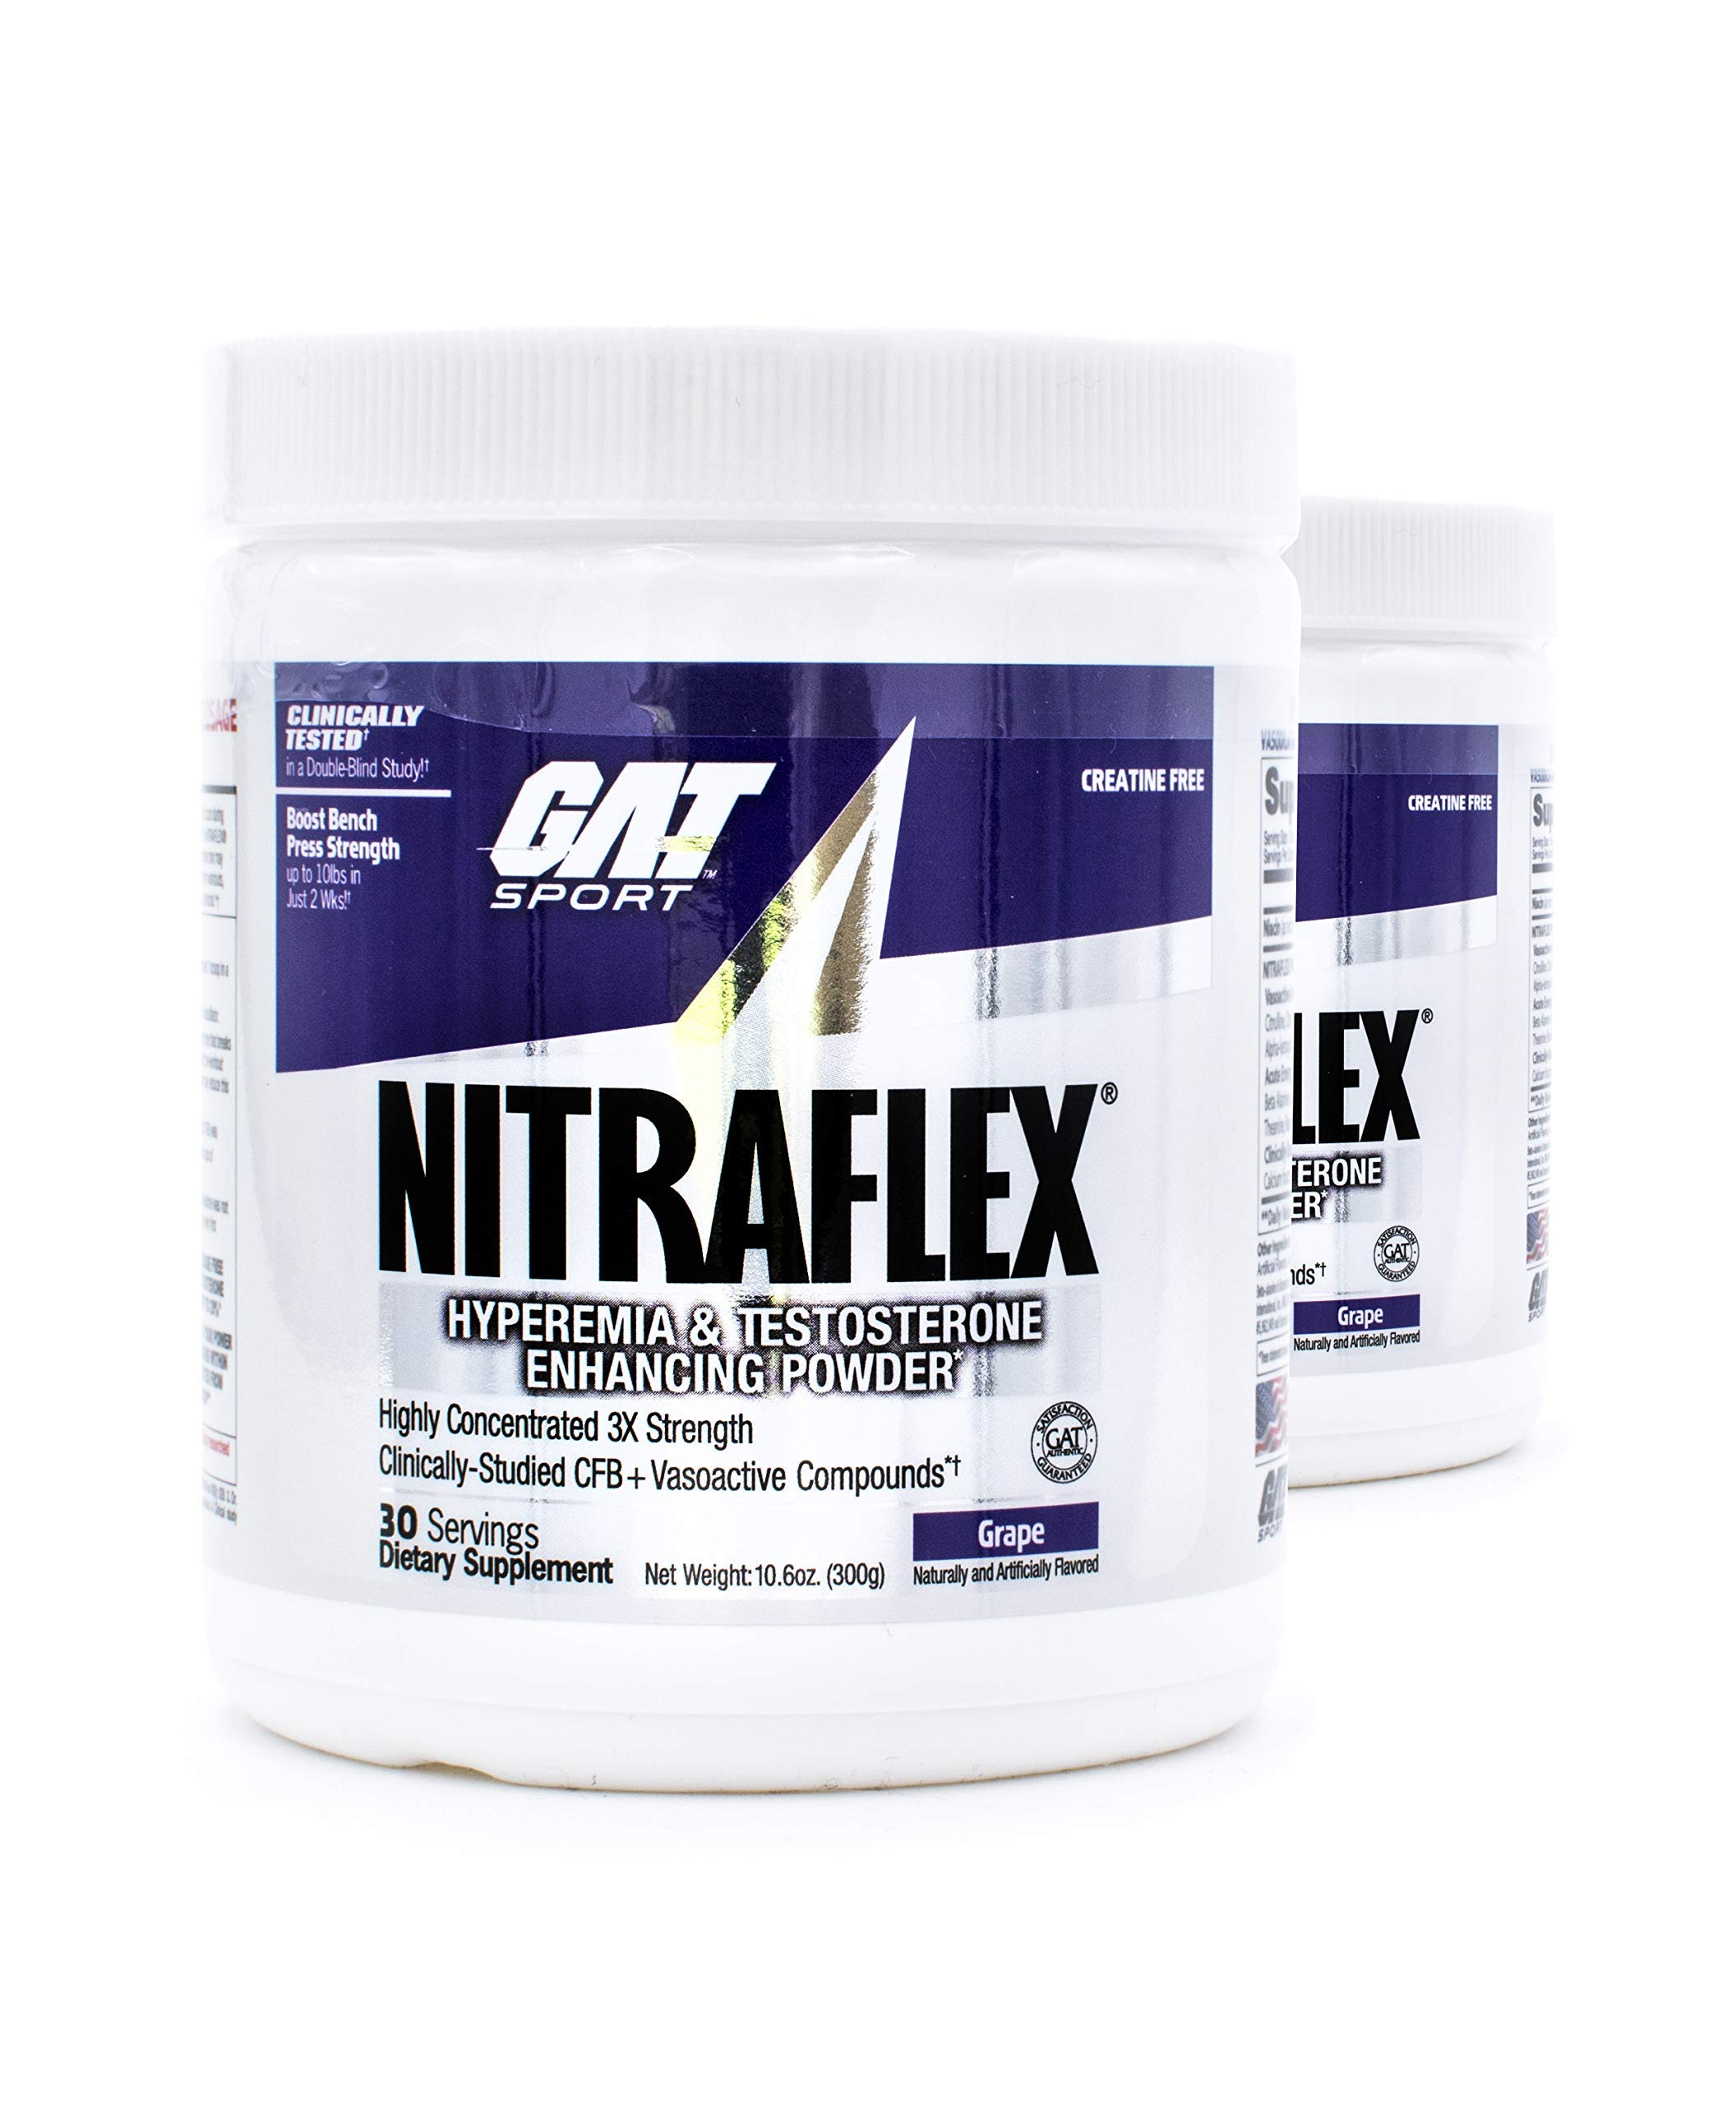 GAT Nitraflex Pre-Workout High-Intensity Training Formula 30 Servings (2-Pack) (Grape)